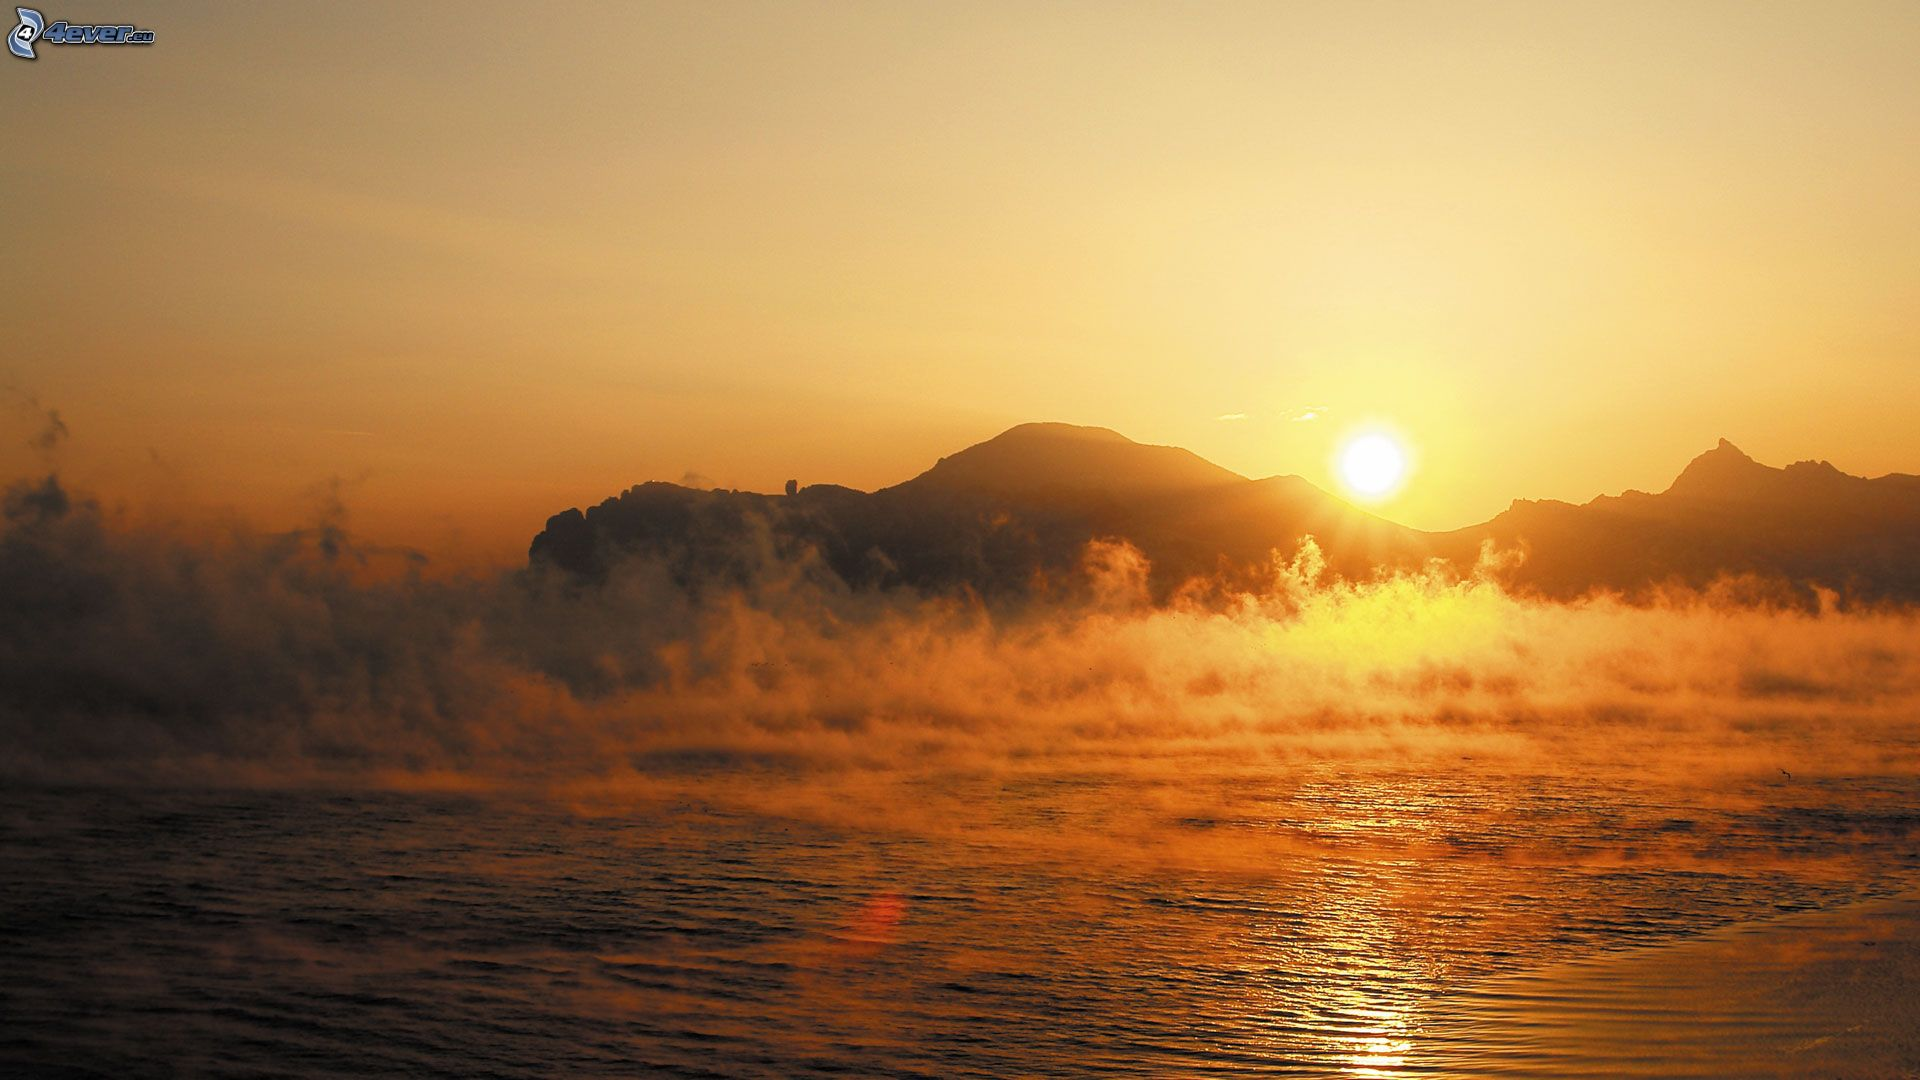 Zalazak sunca  - Page 4 Zapad-slnka-za-kopcom,-jazero-154238